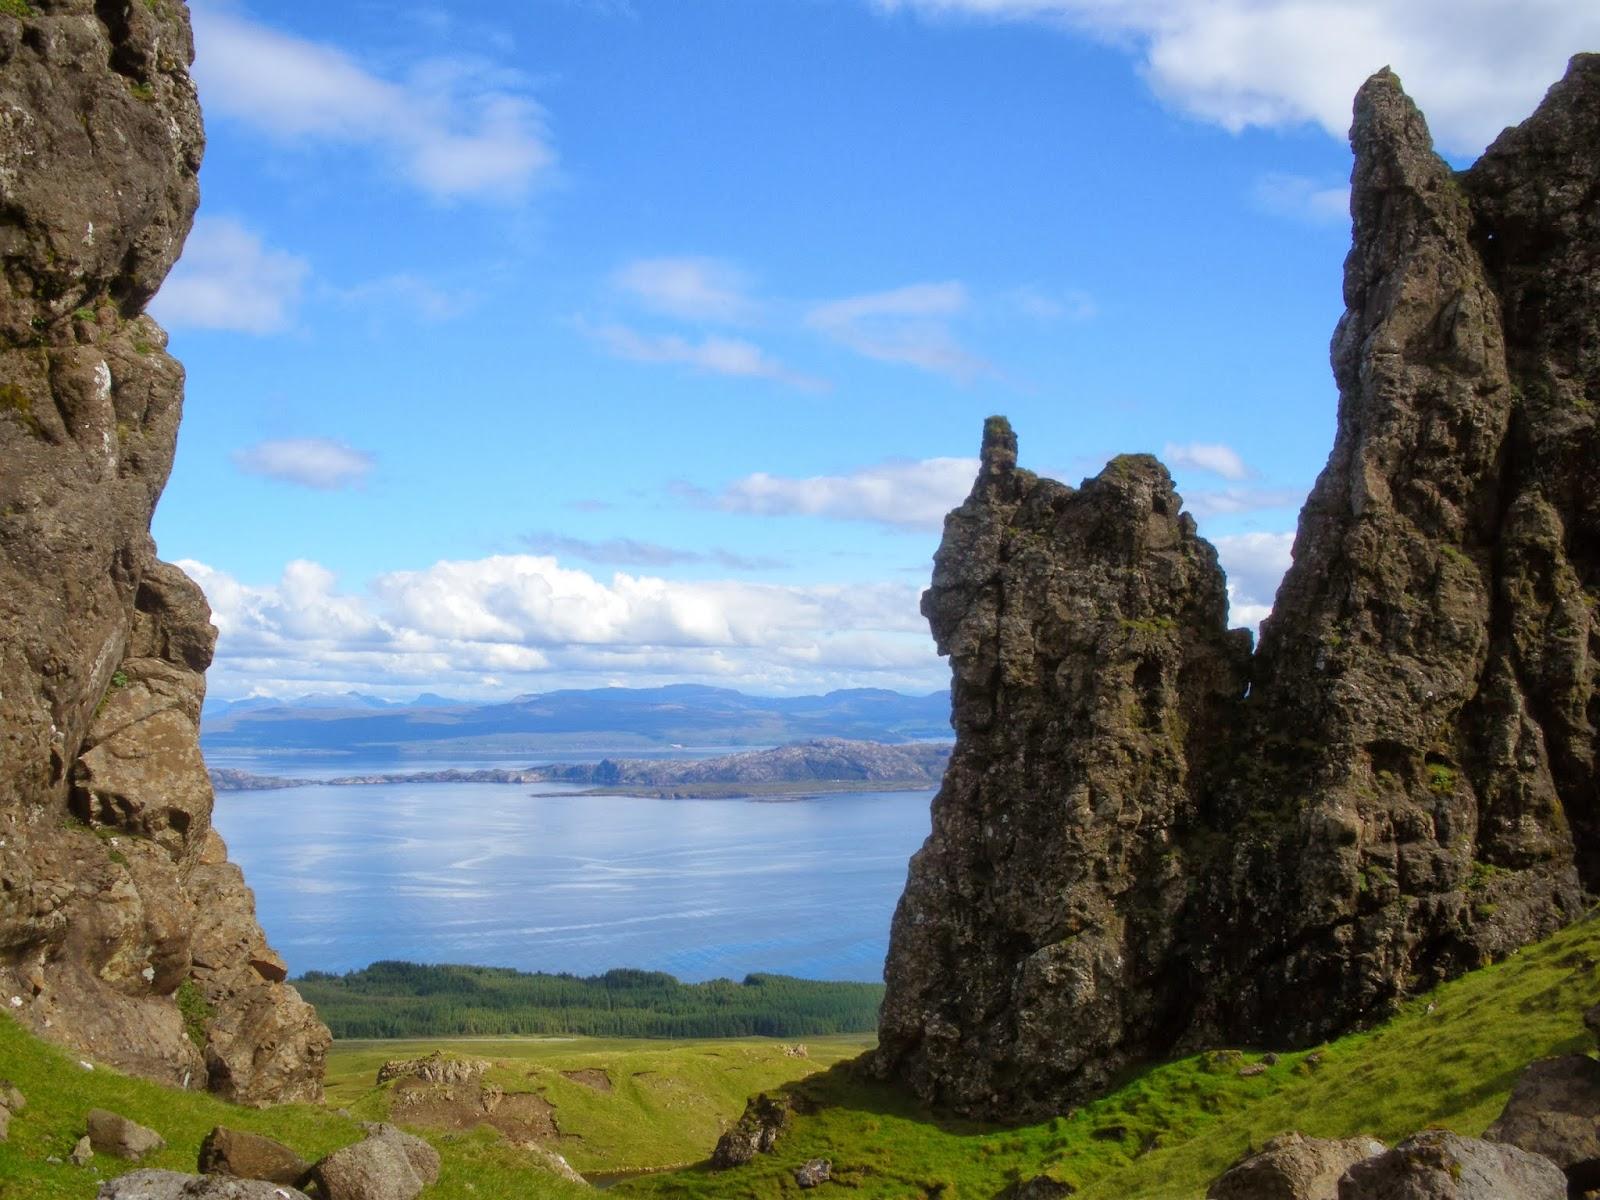 Isle of Skye, Trotternish, Highlands, Scotland, Escocia, United Kingdom, Old Man of Storr